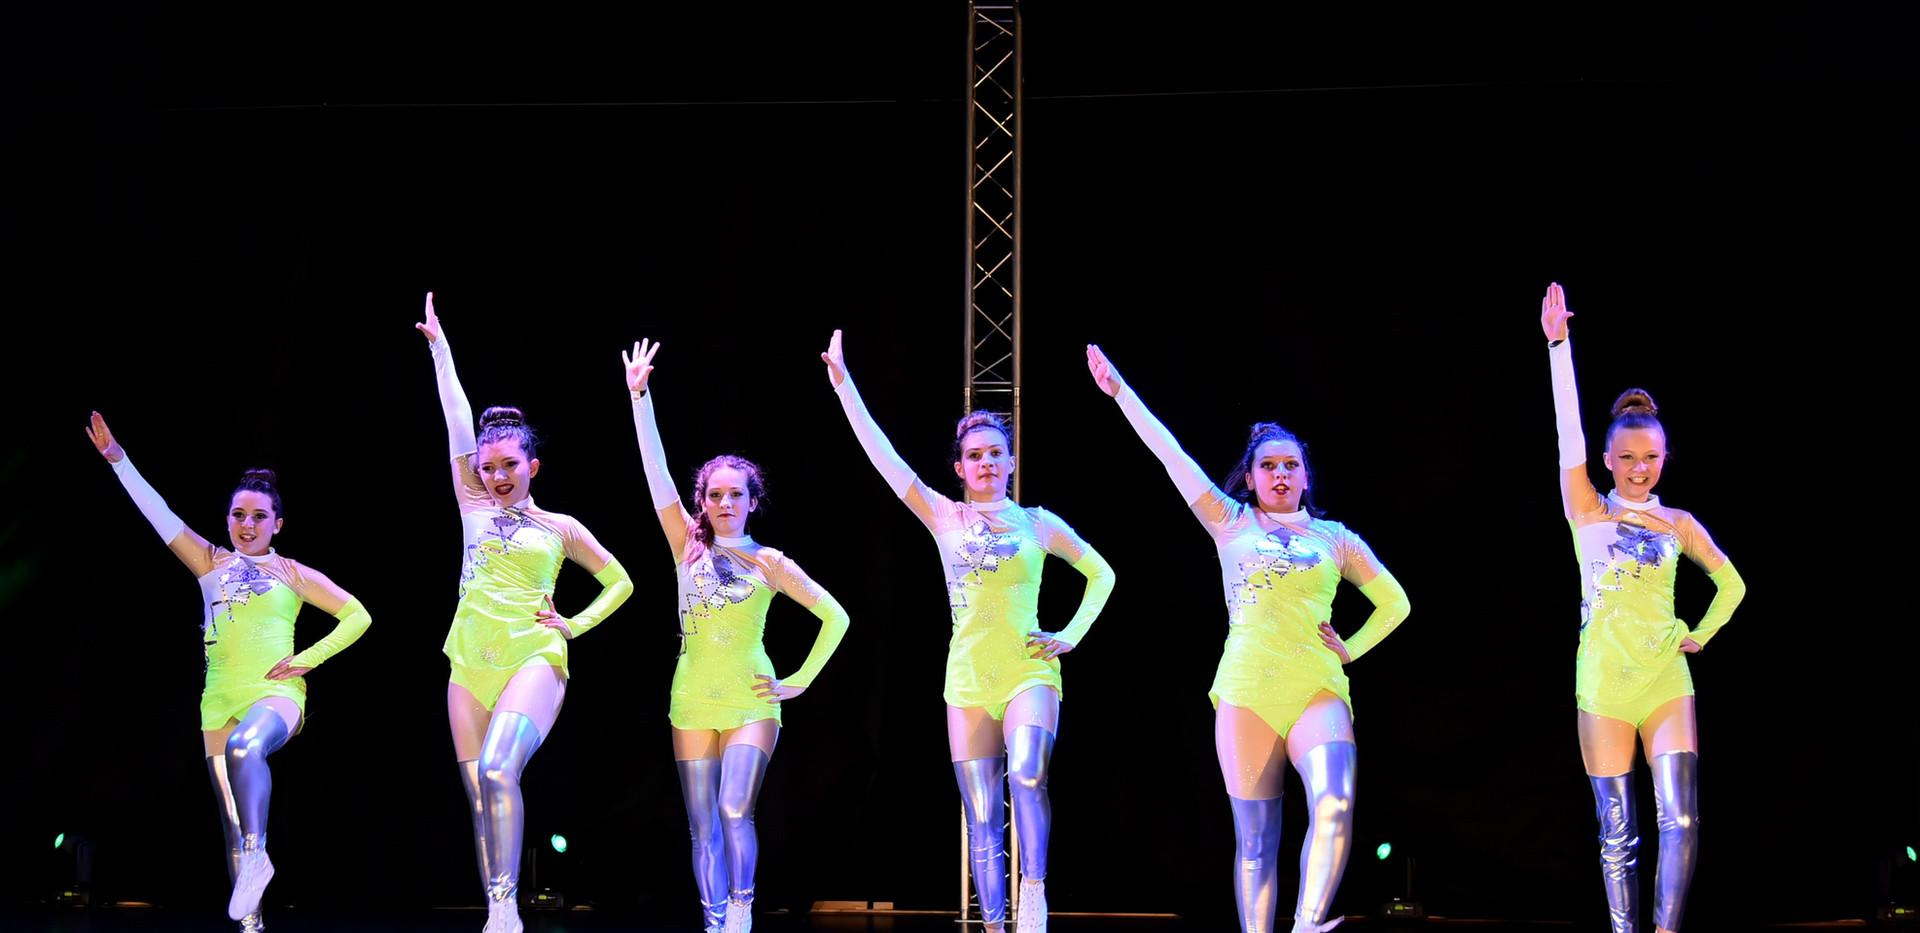 DANCE SHOW 19 - Rocking Girls (5)_GF.jpg